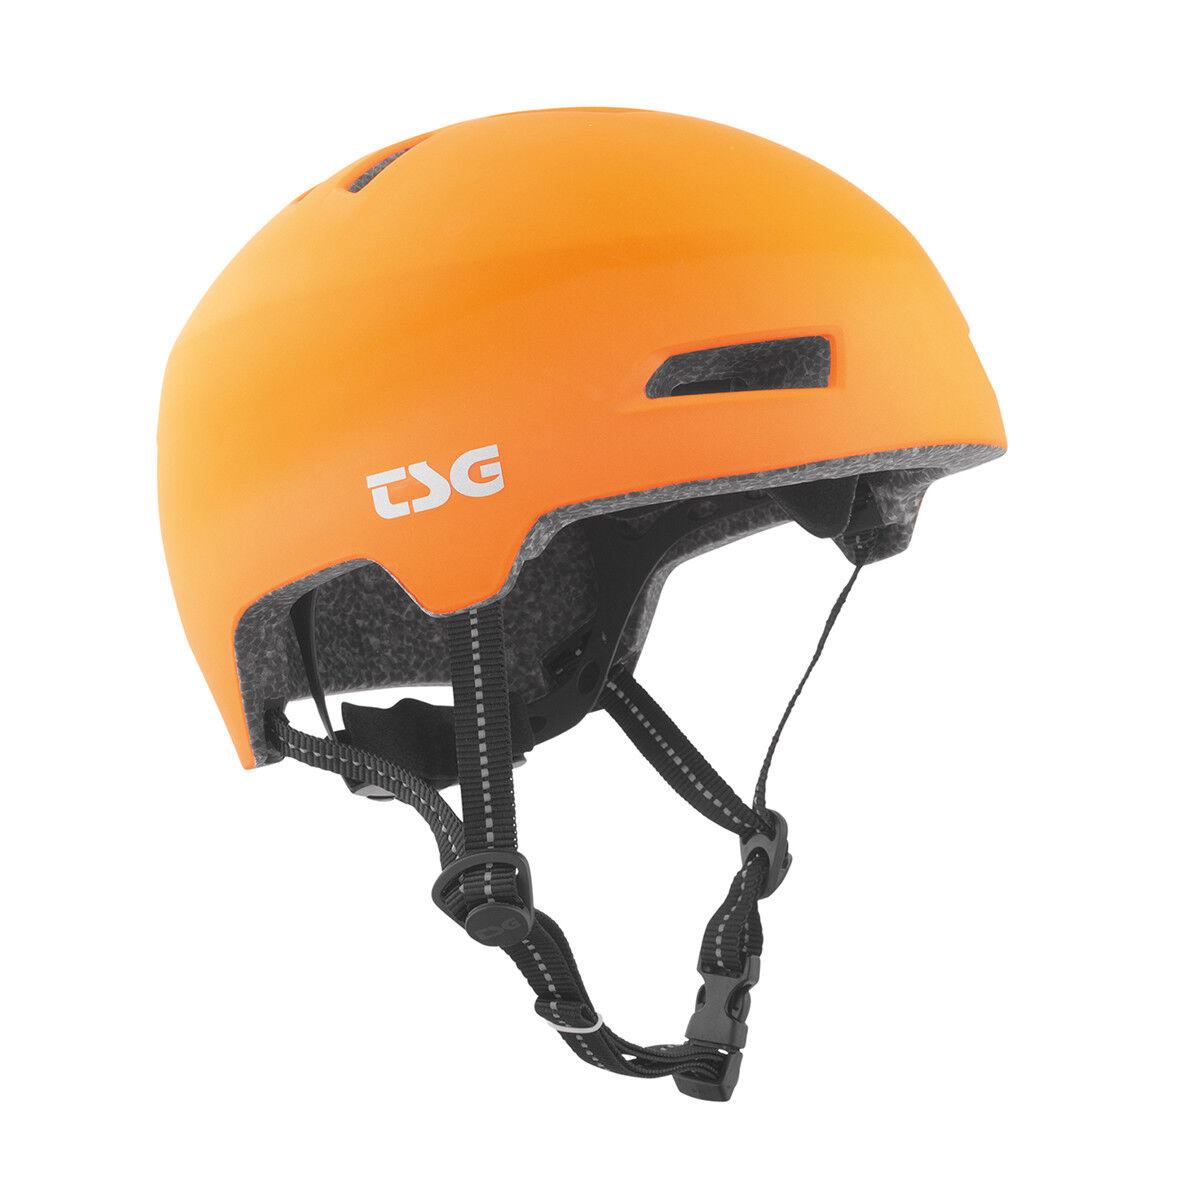 TSG - Status Solid color - Bicycle Helmet